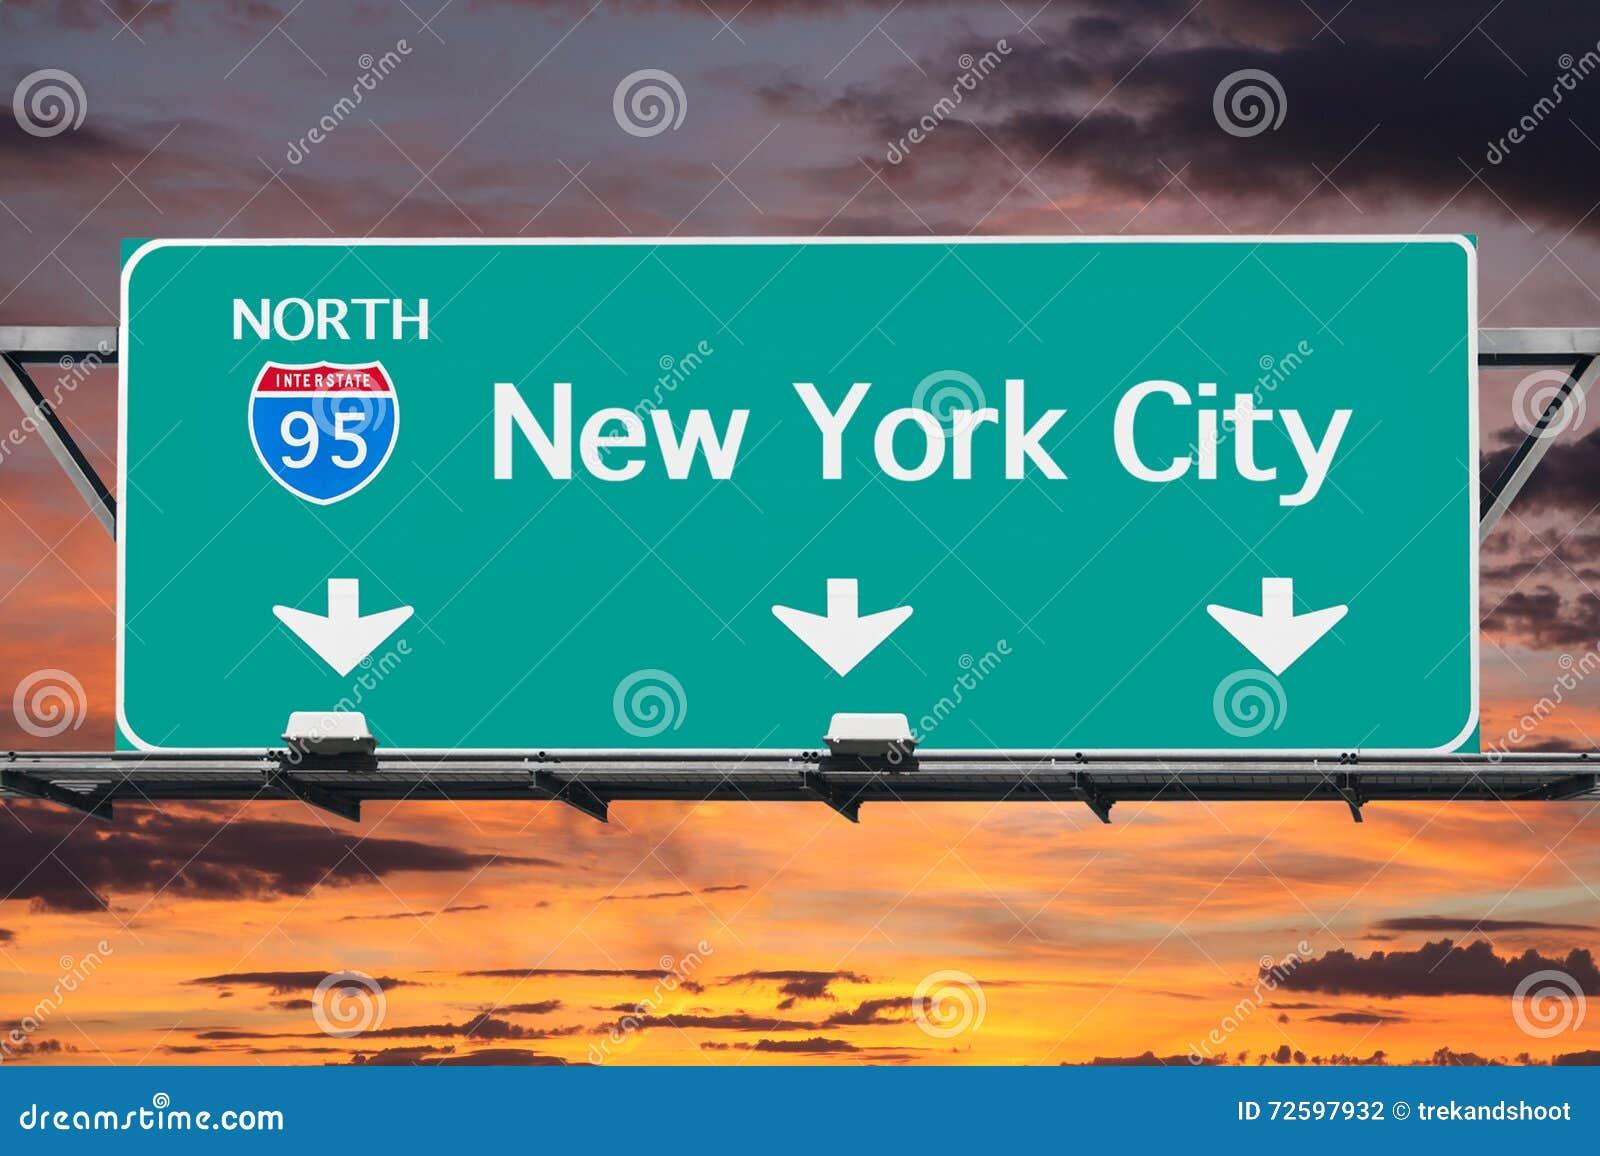 Run in 2019 | TCS New York City Marathon